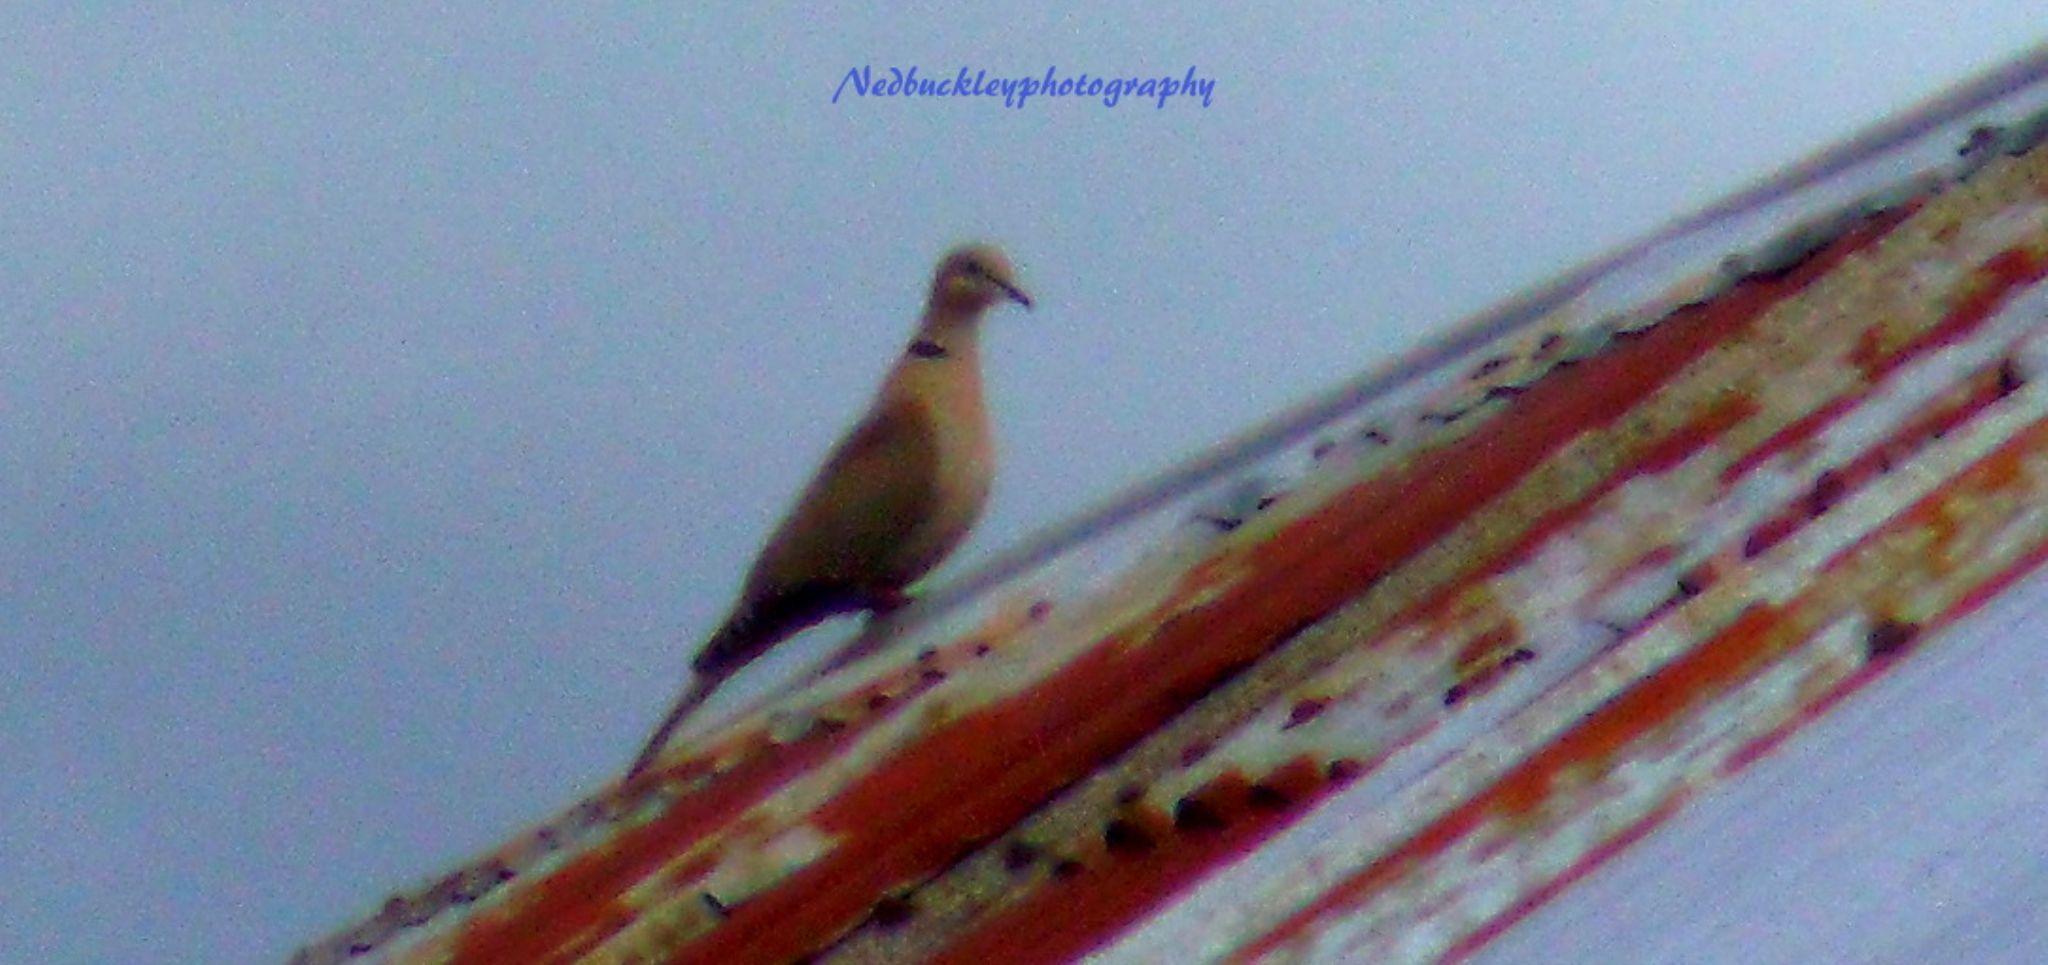 Bird on a tin roof  by Nedbuckleyphotography